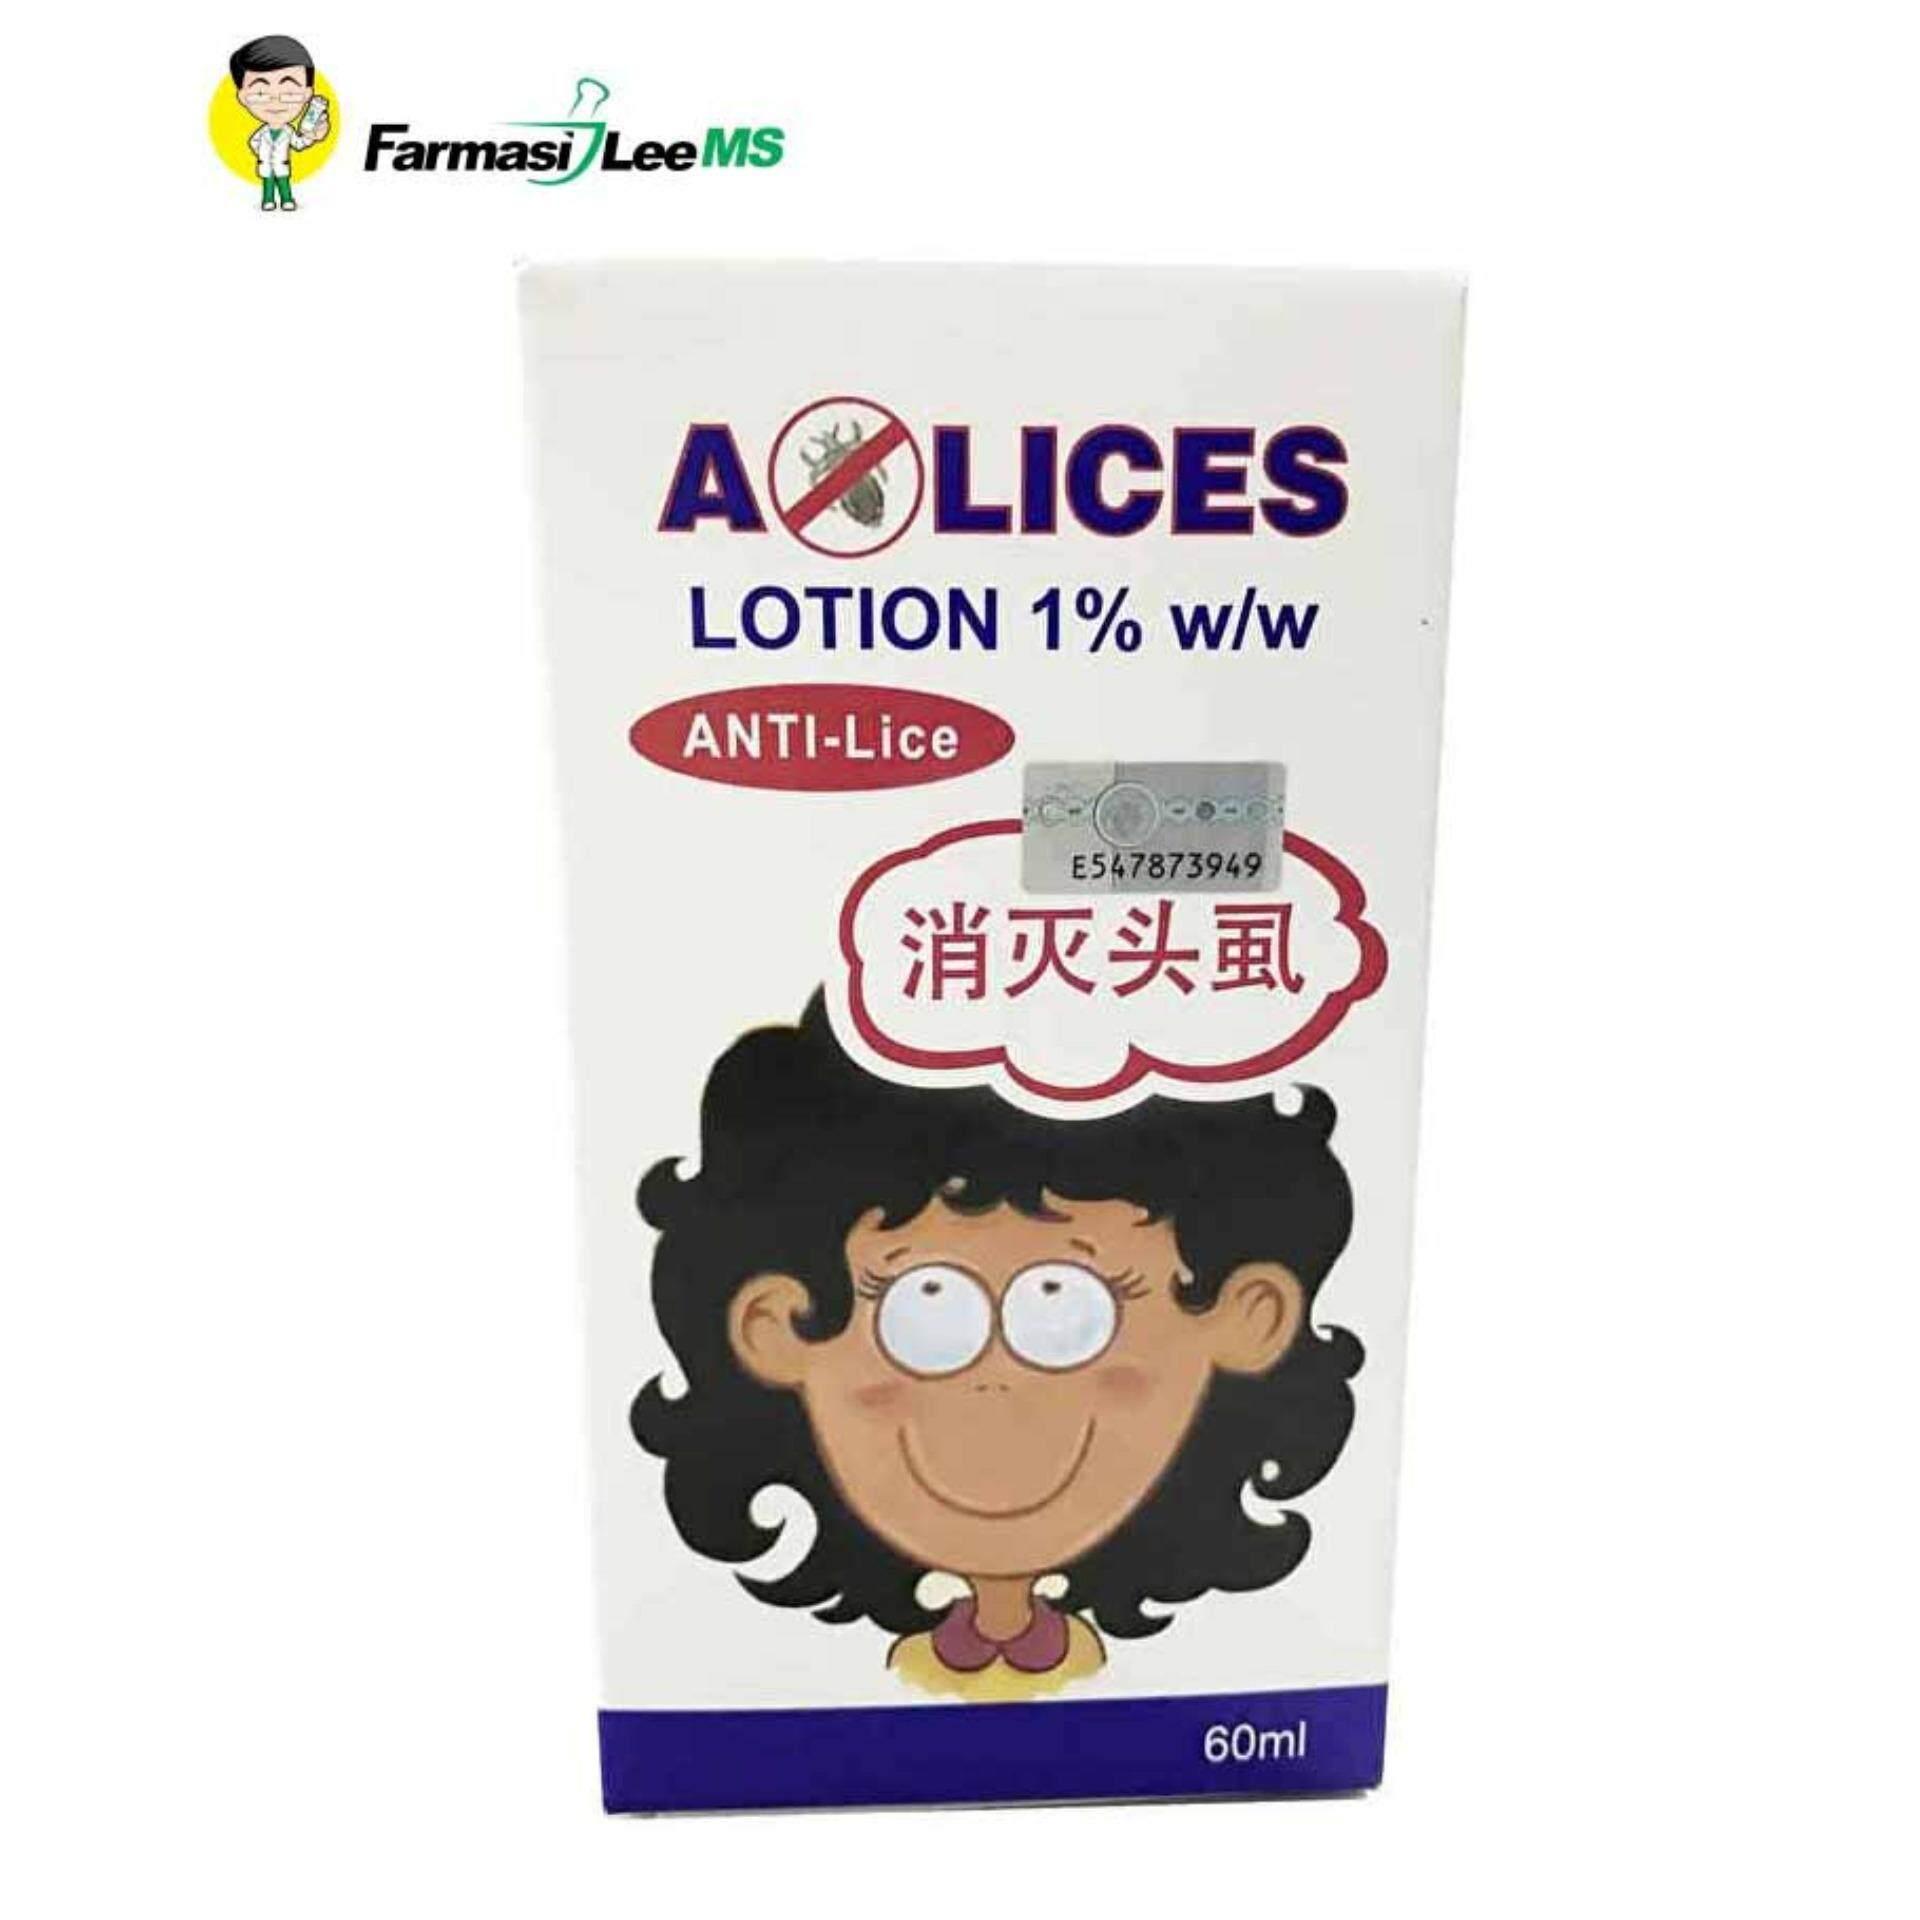 Hot Deals Alices Lotion 1 W 60ml Anti Kutu Lice Bajet Terbaik Shampoo Cheapest Price